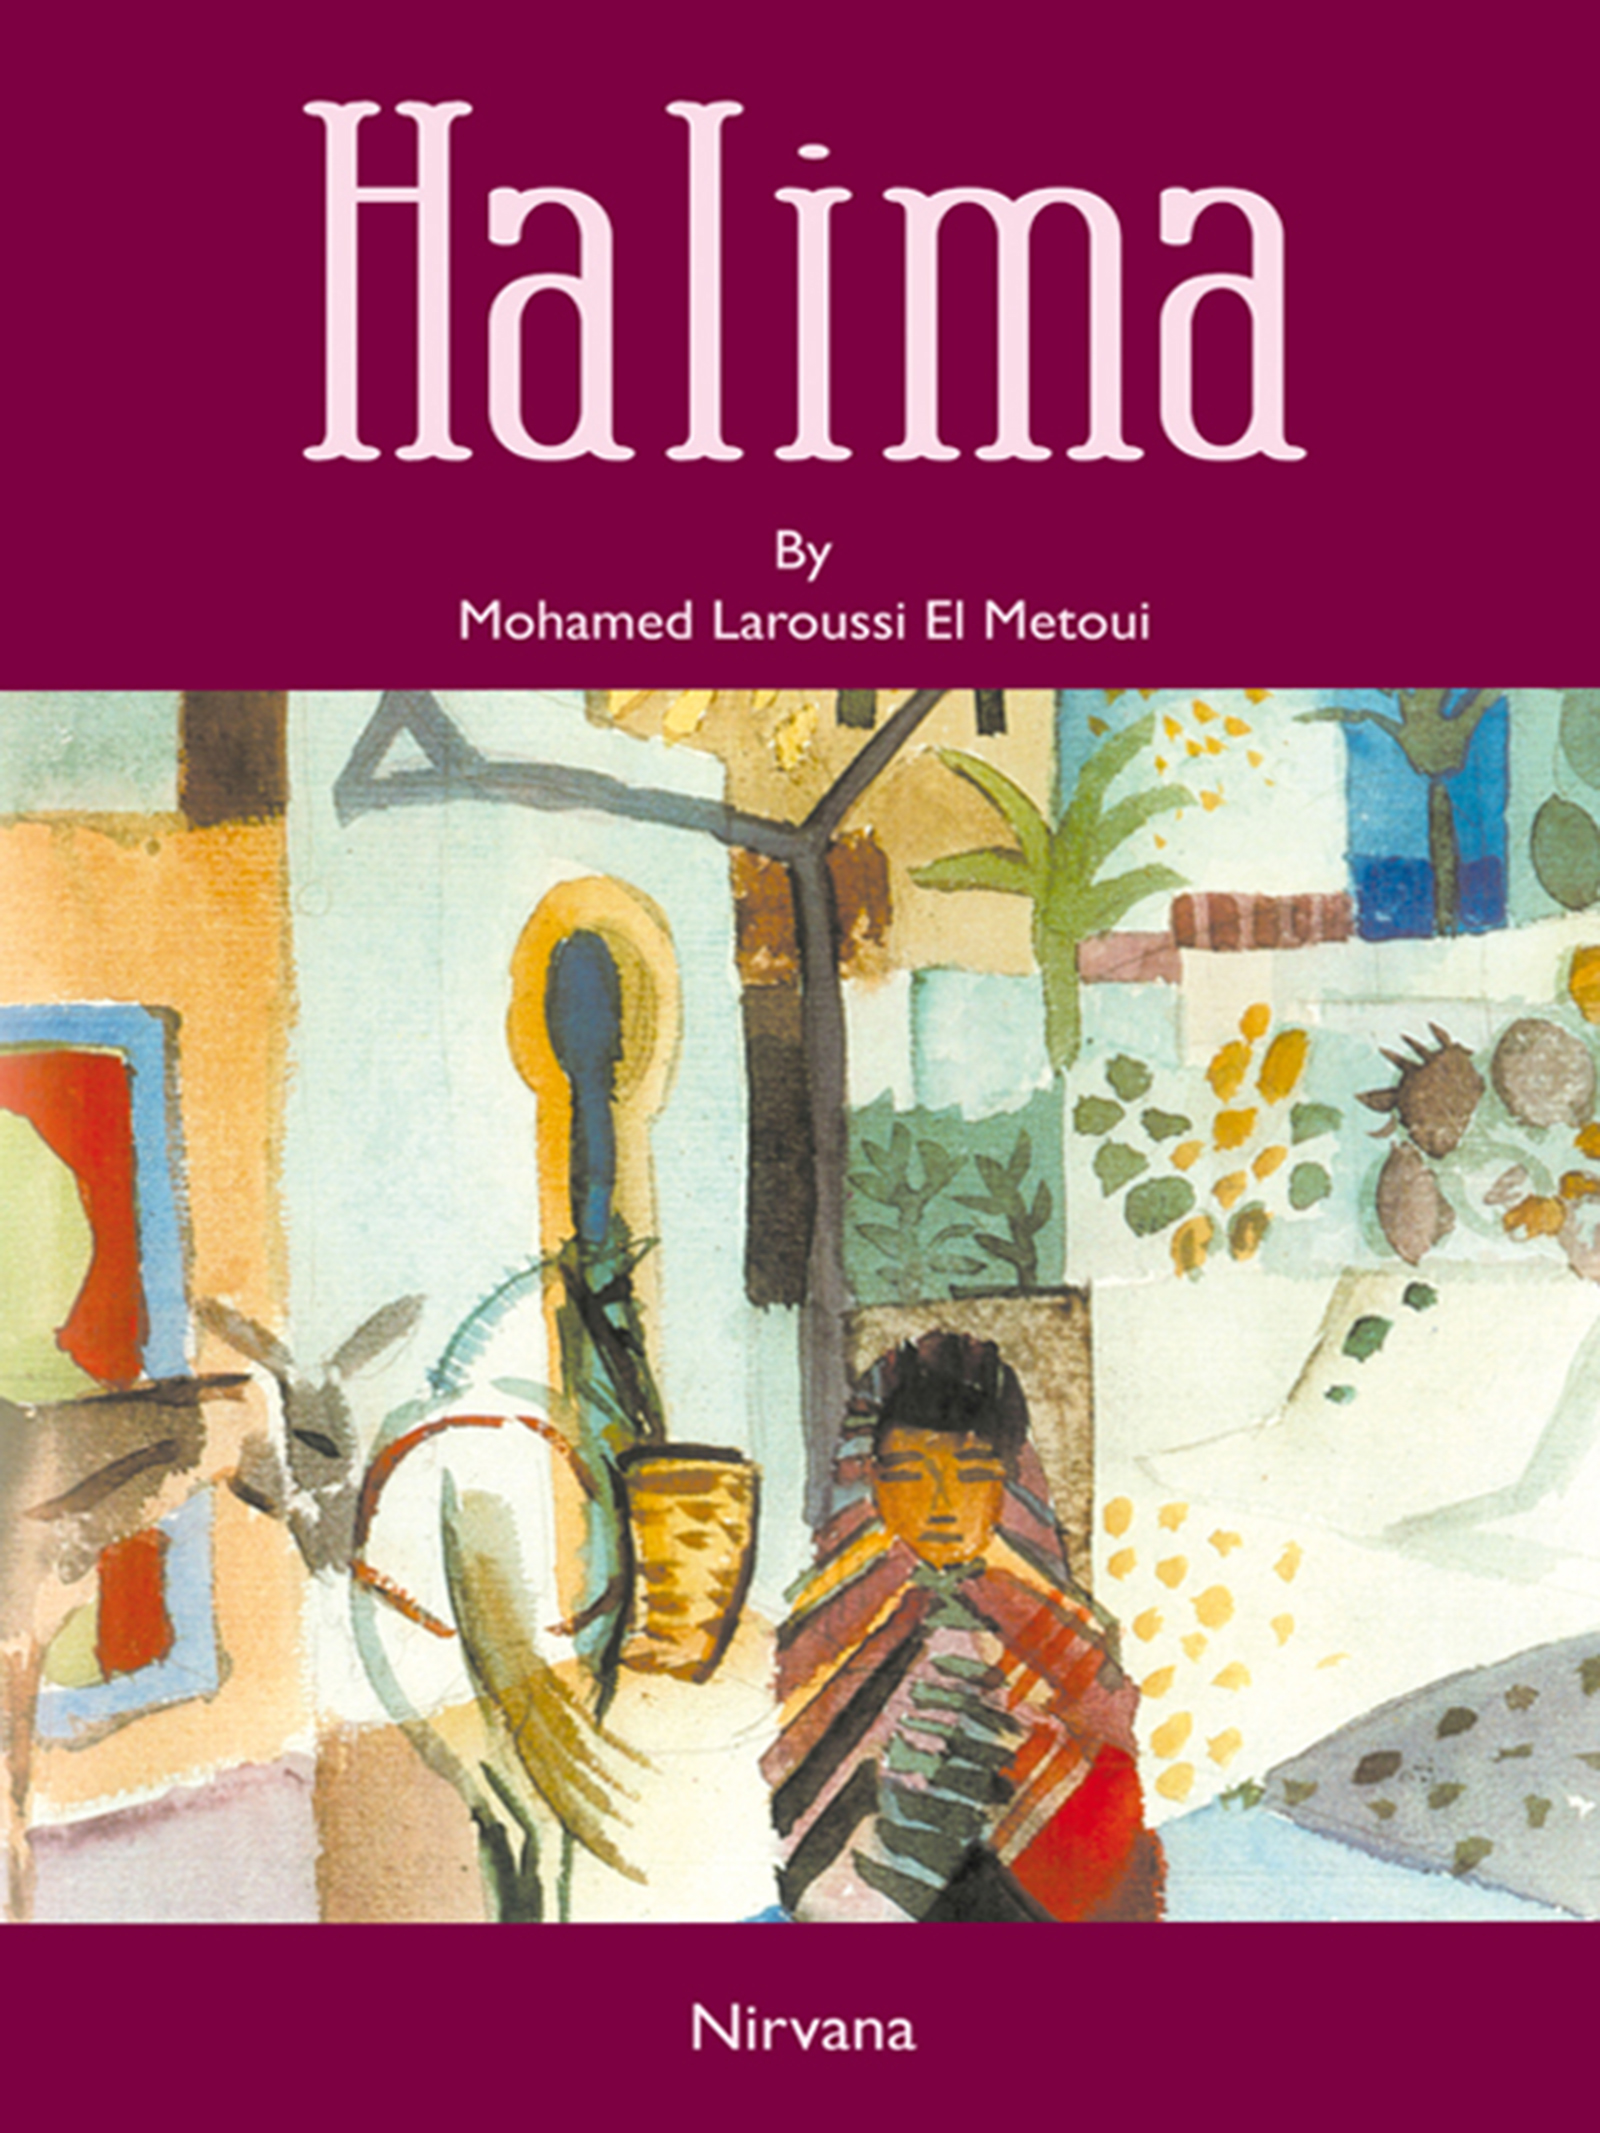 Halima, Family secrets and politics